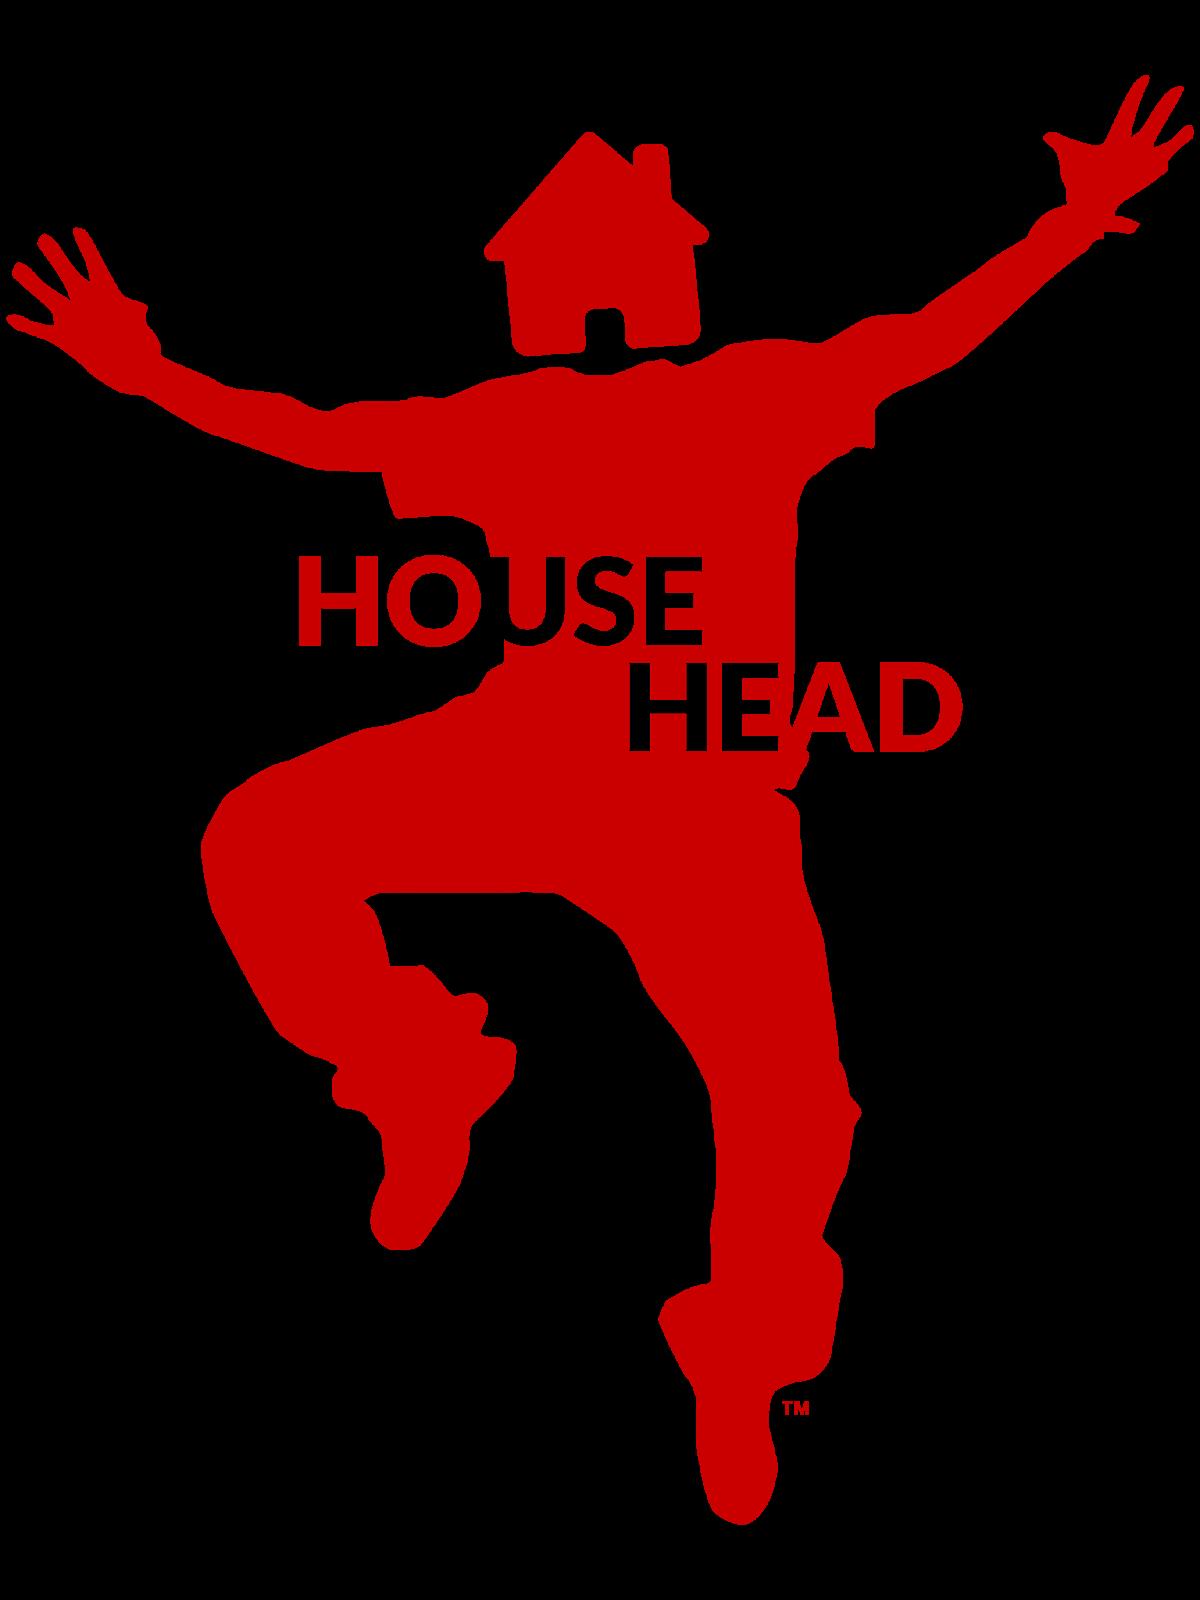 I love house music house music edm electronica oscar for Us house music